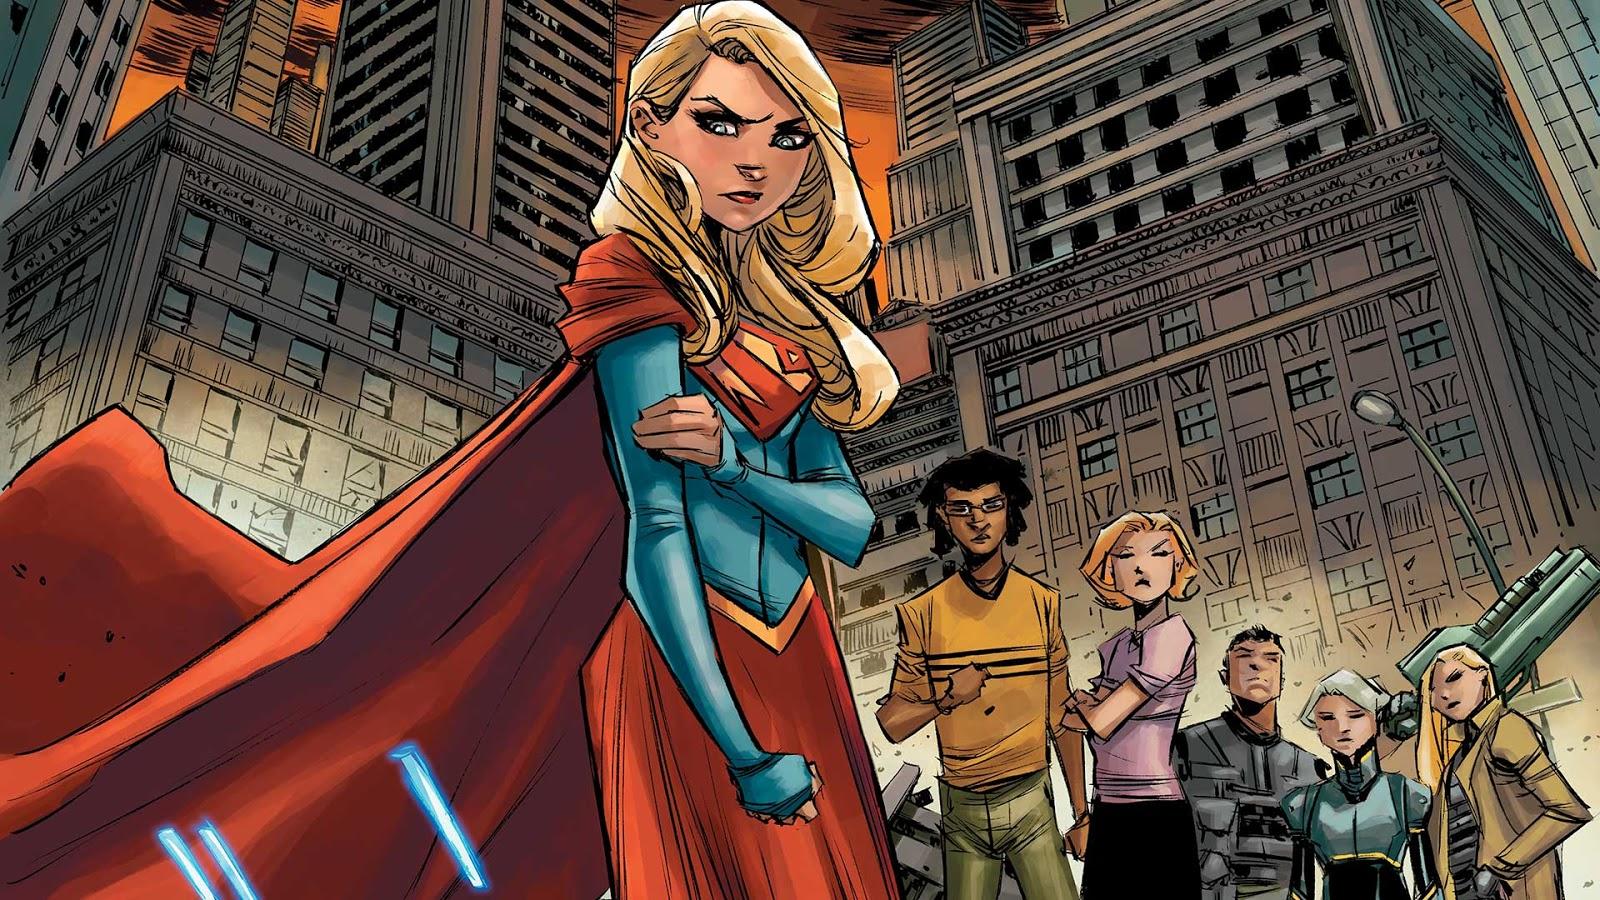 Supergirl comics images 91